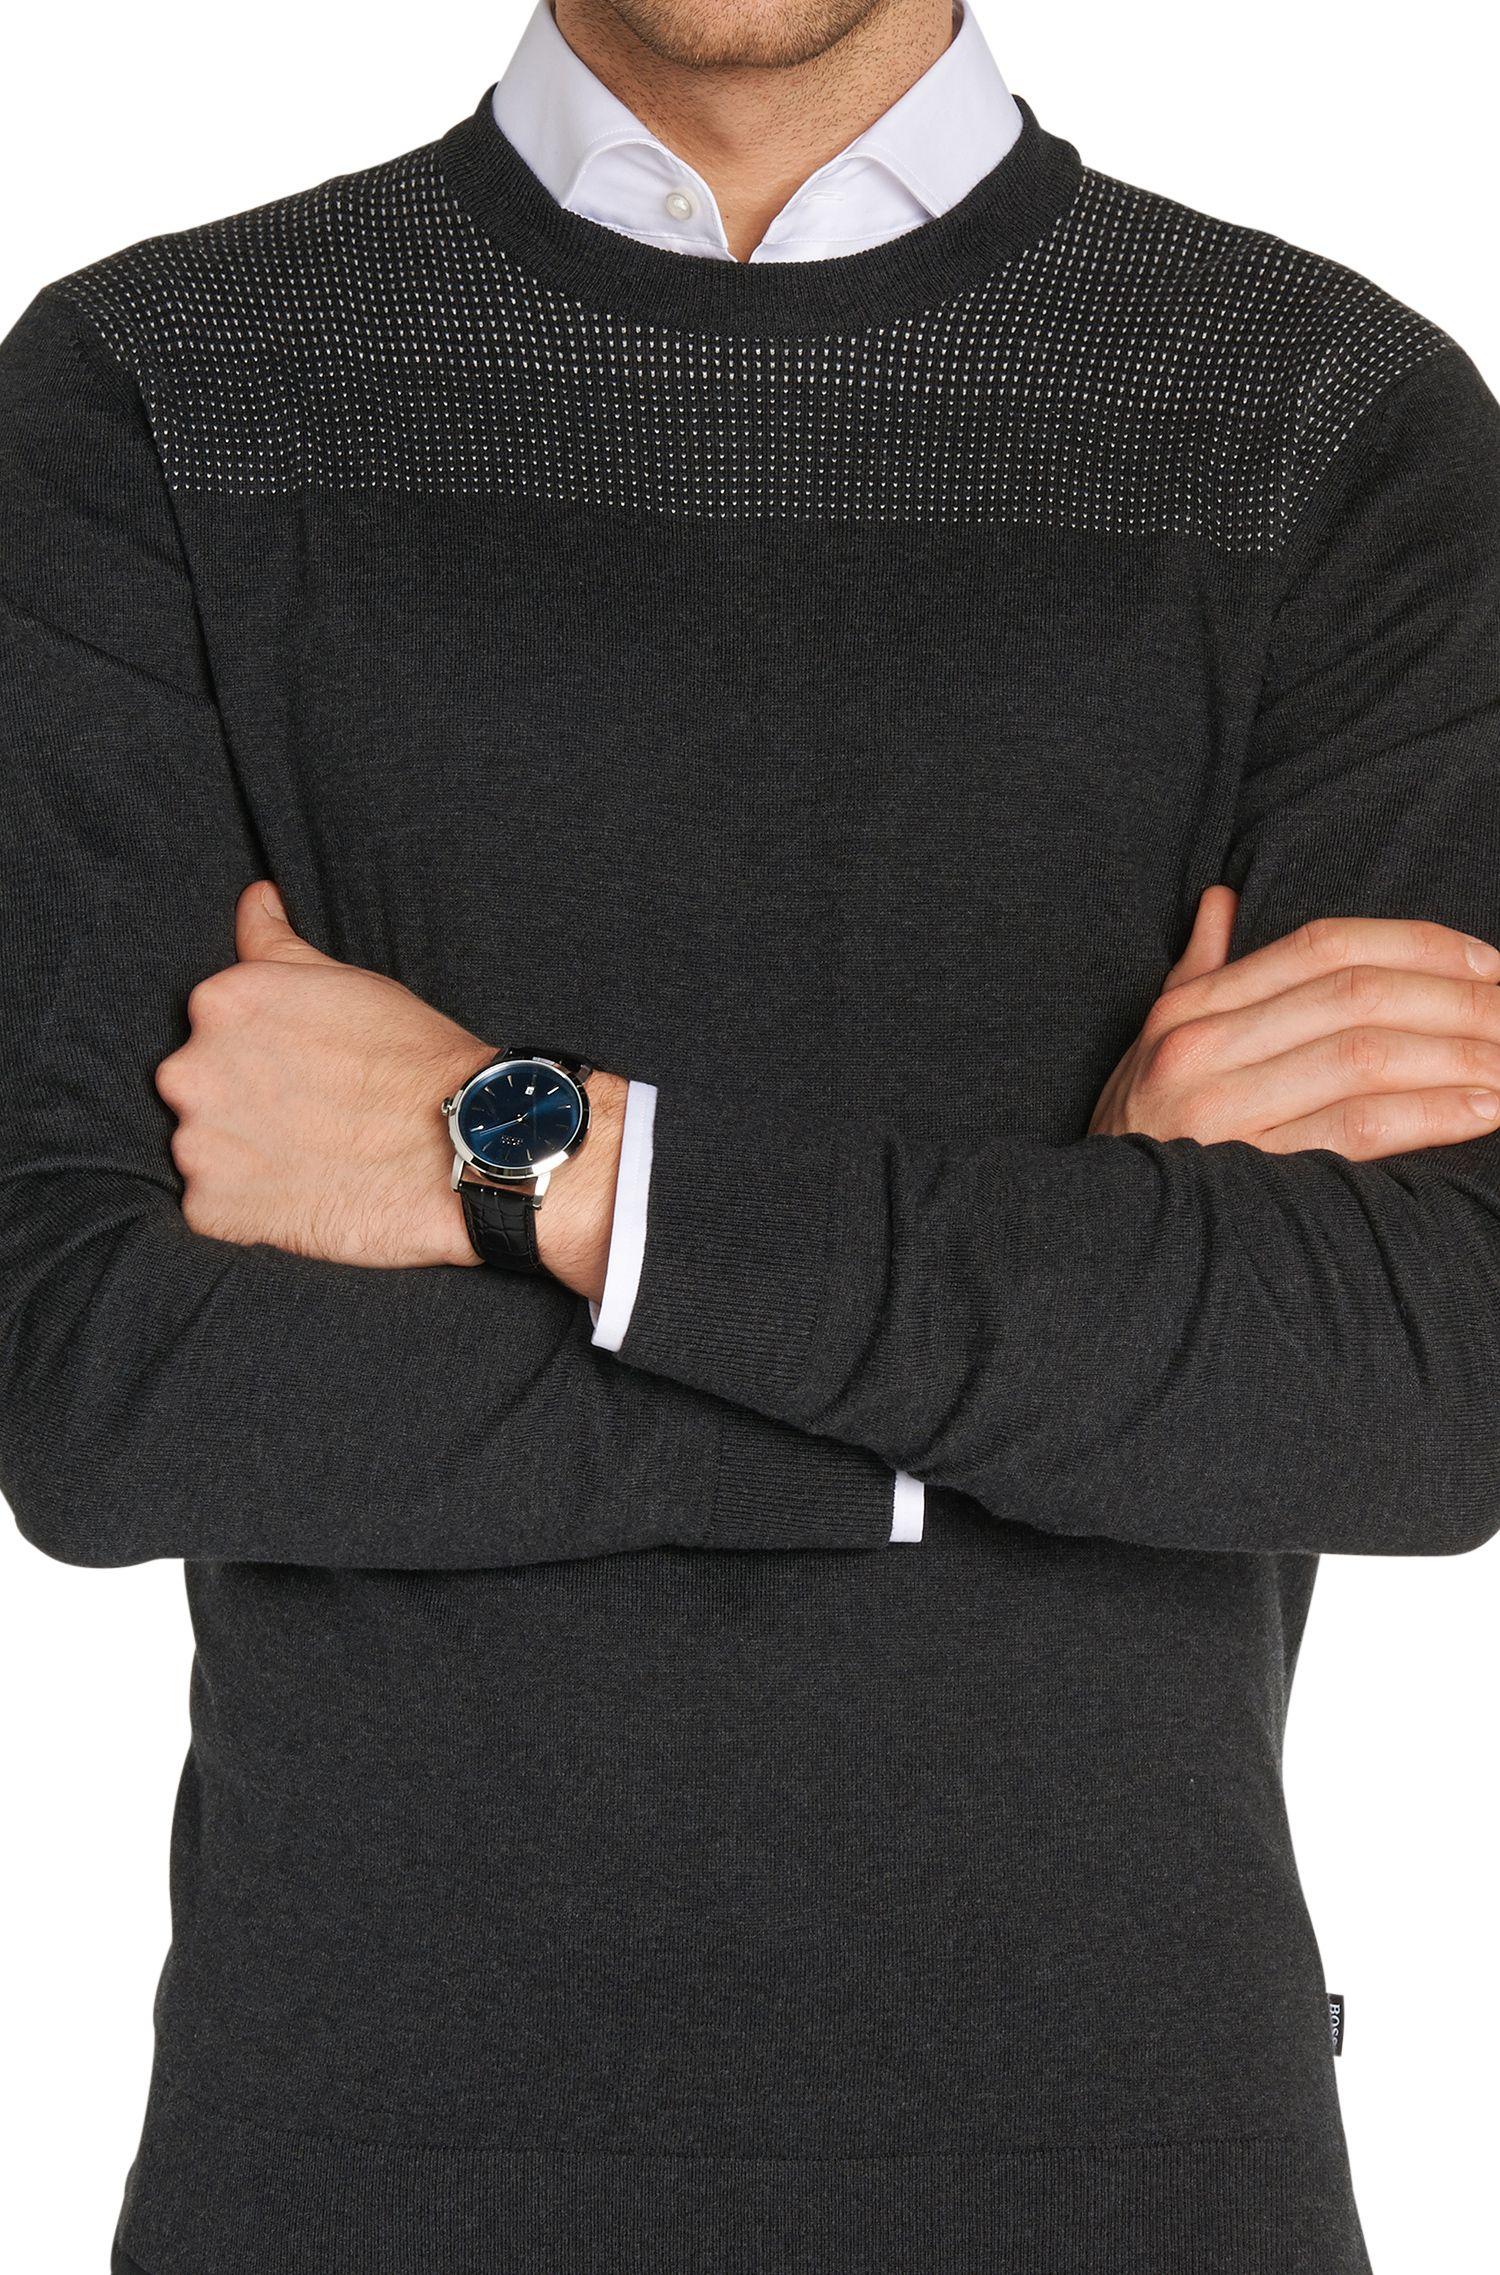 Montre-bracelet «HB1013» avec cadran bleu